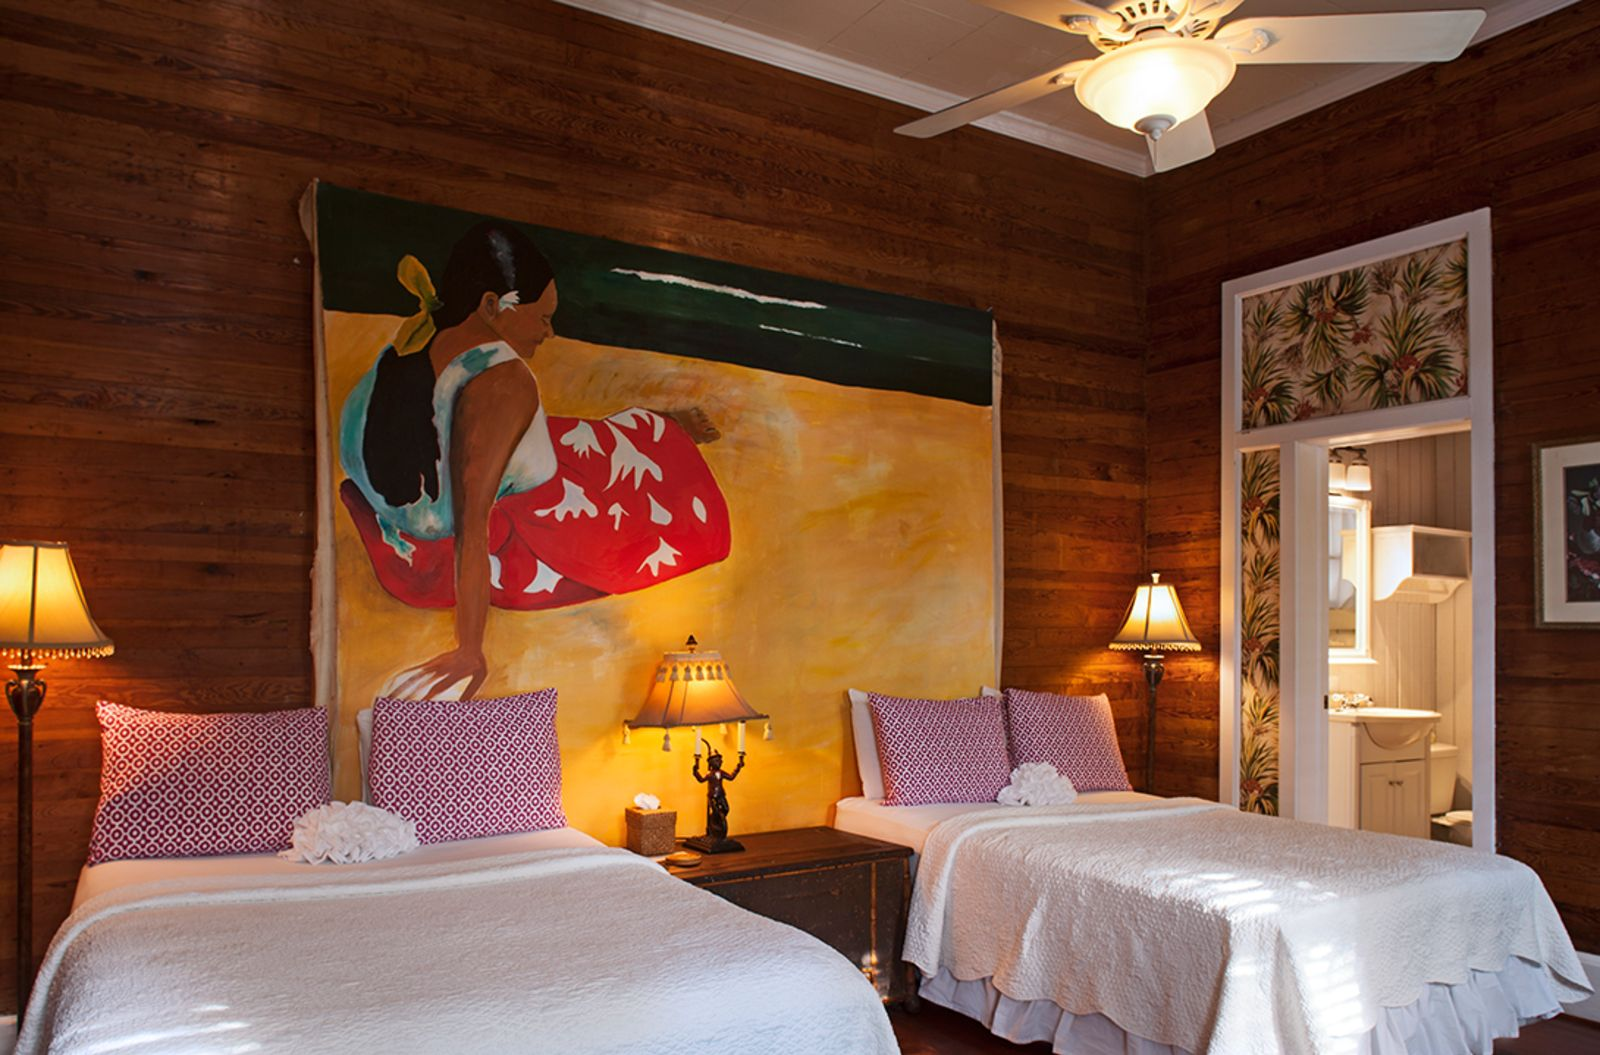 Relaxing Key West Florida Getaway | Key West Bed and Breakfast